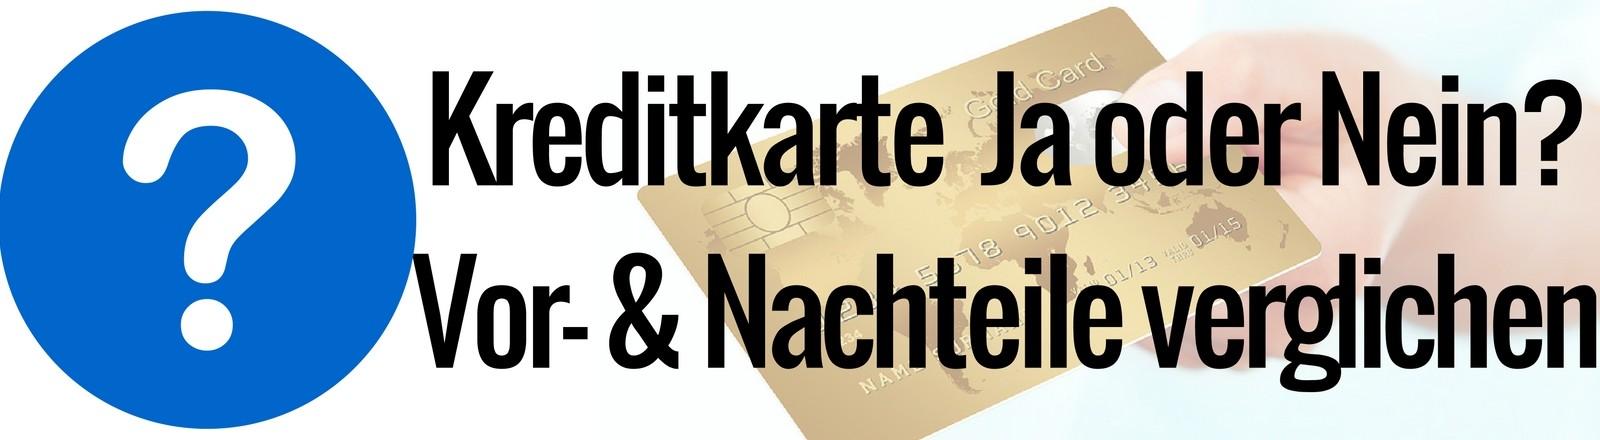 Kreditkarte beantragen Dauer